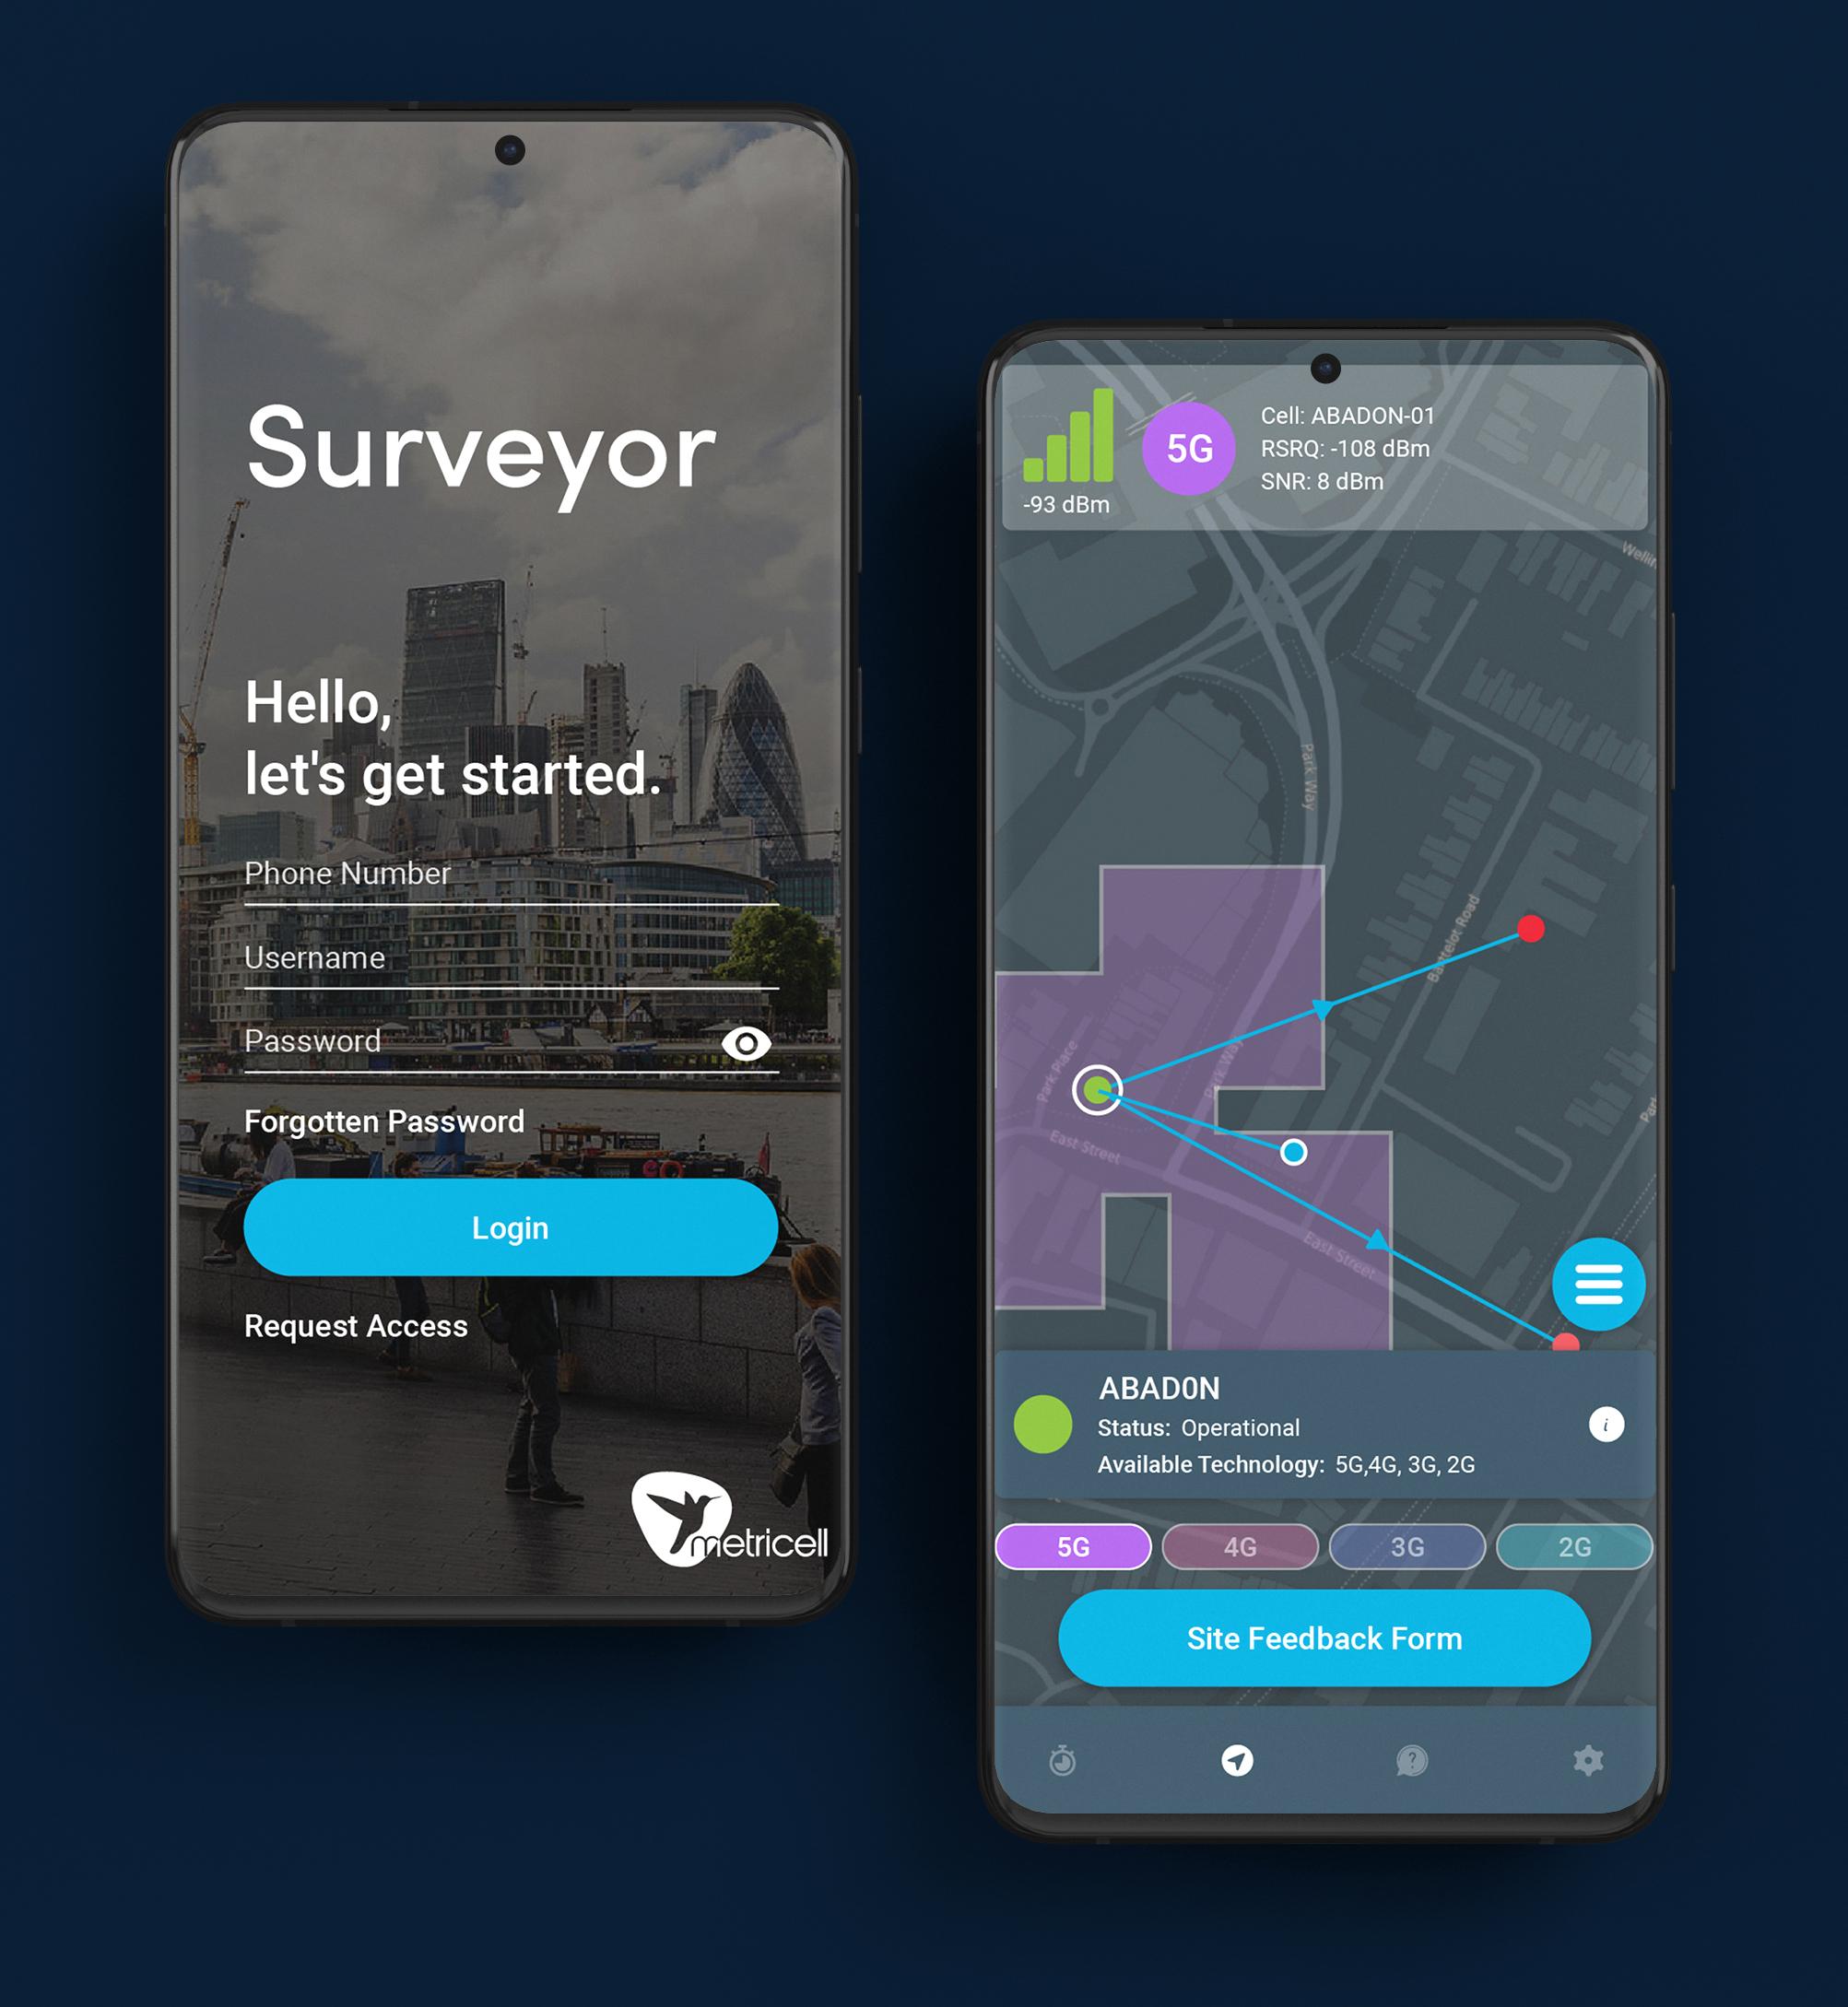 Surveyor on smartphone